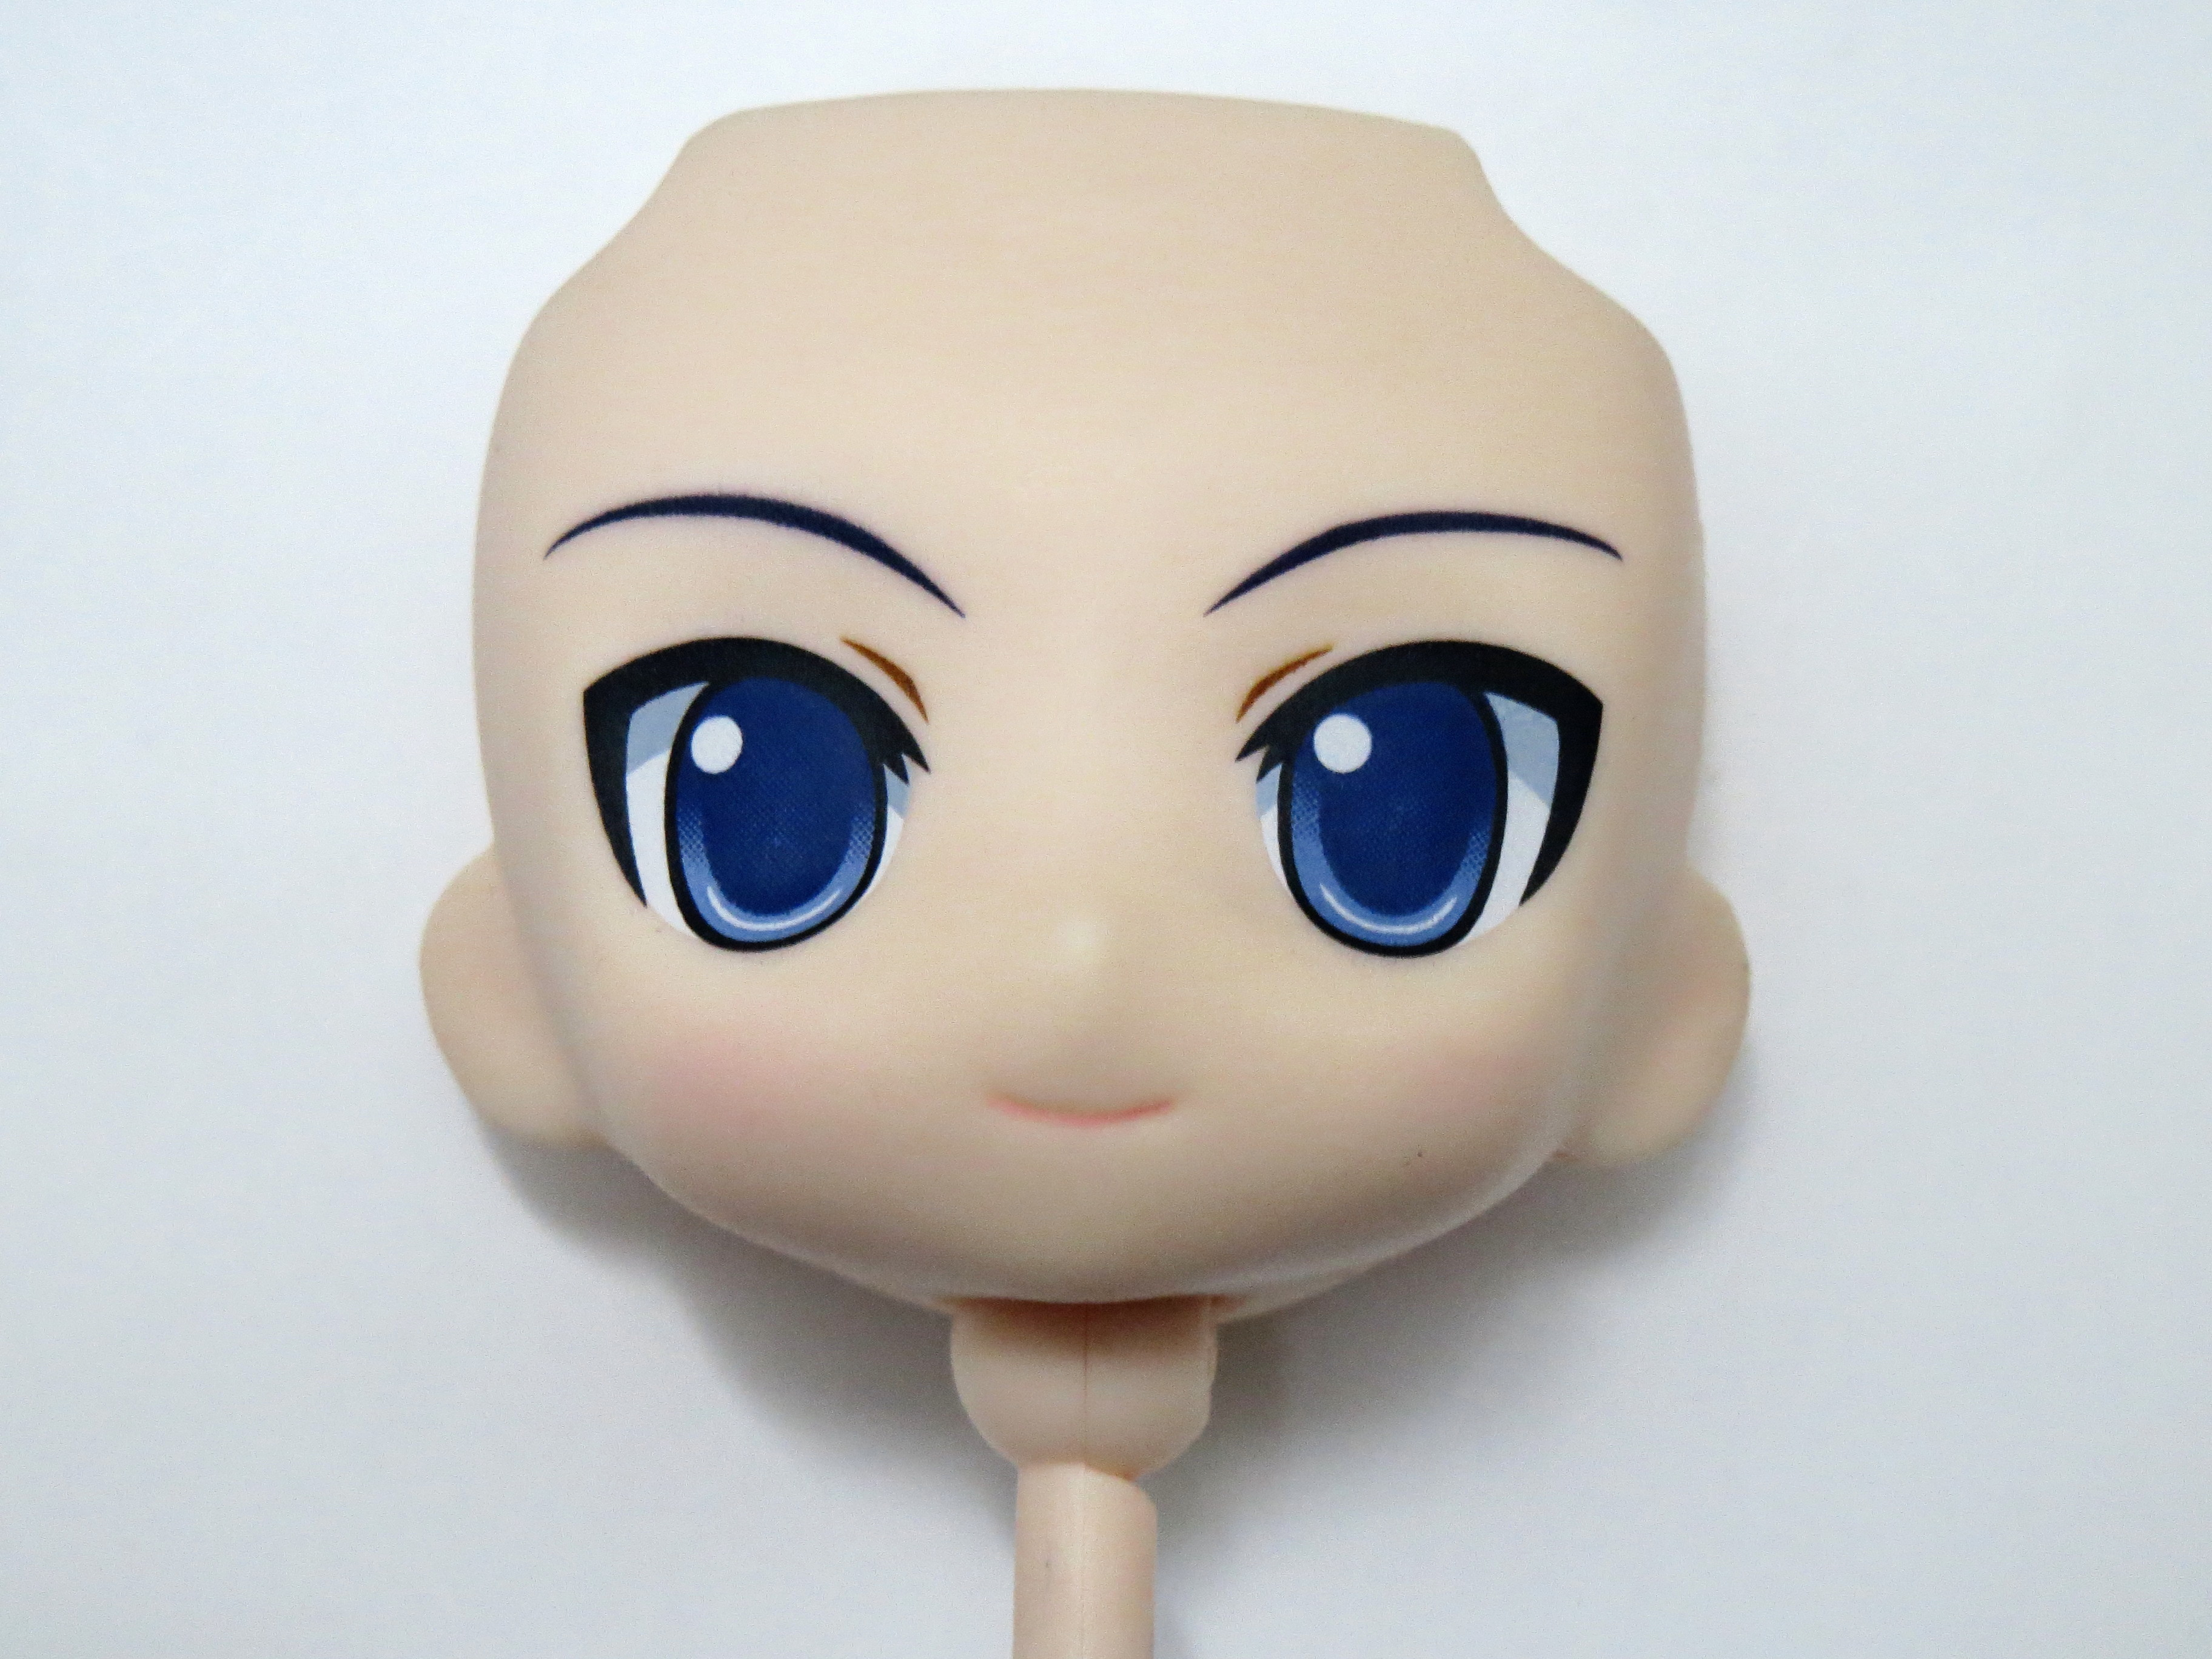 【058】 KAITO 顔パーツ 普通 ねんどろいど